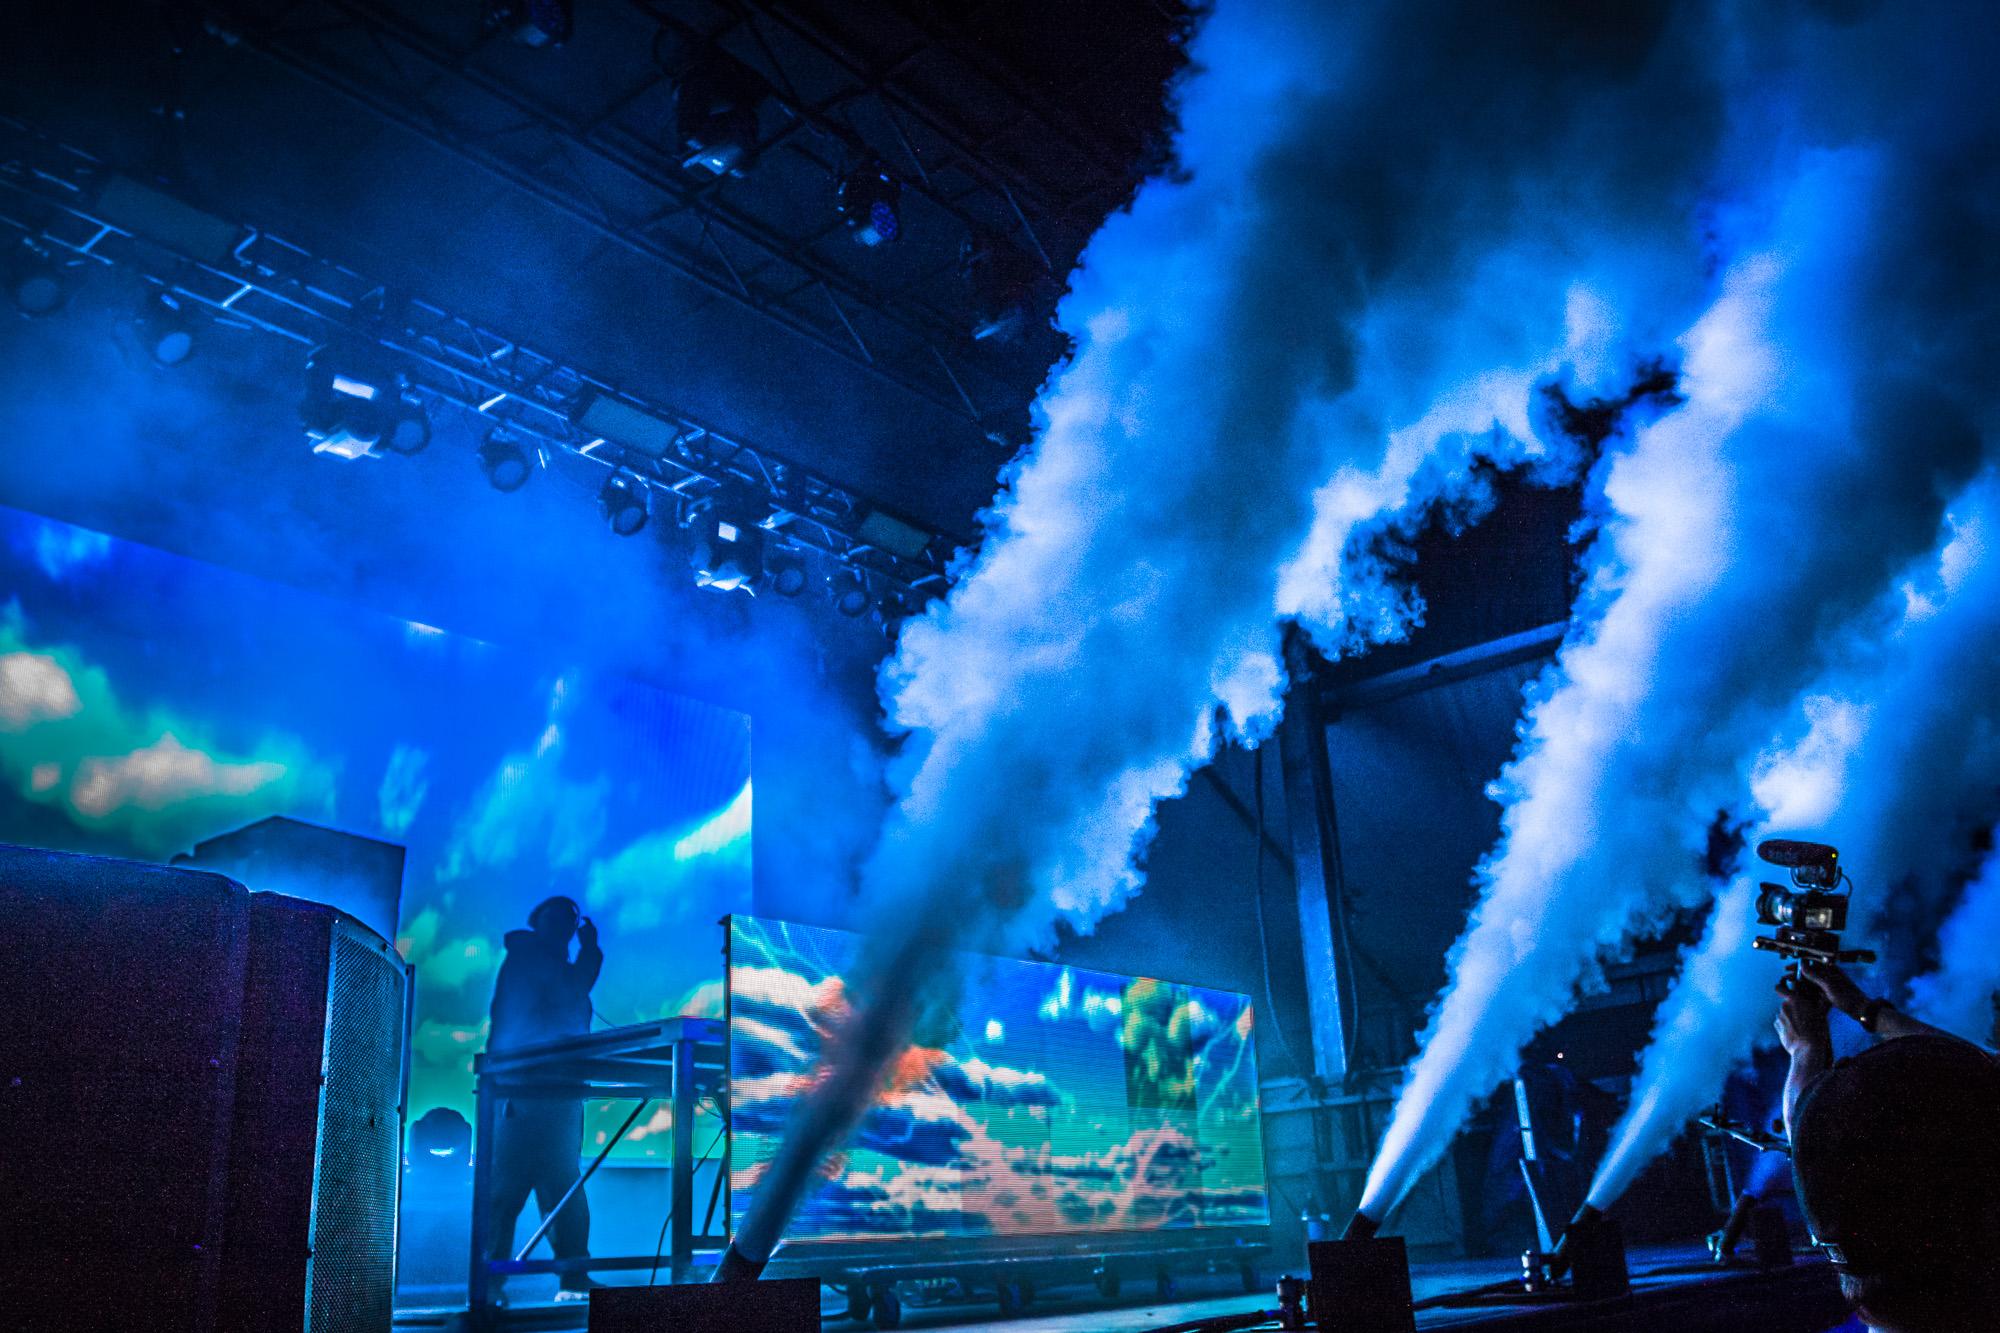 DJ Mustard smoke Cannons by Scott Penner @ RBC Ottawa Bluesfest